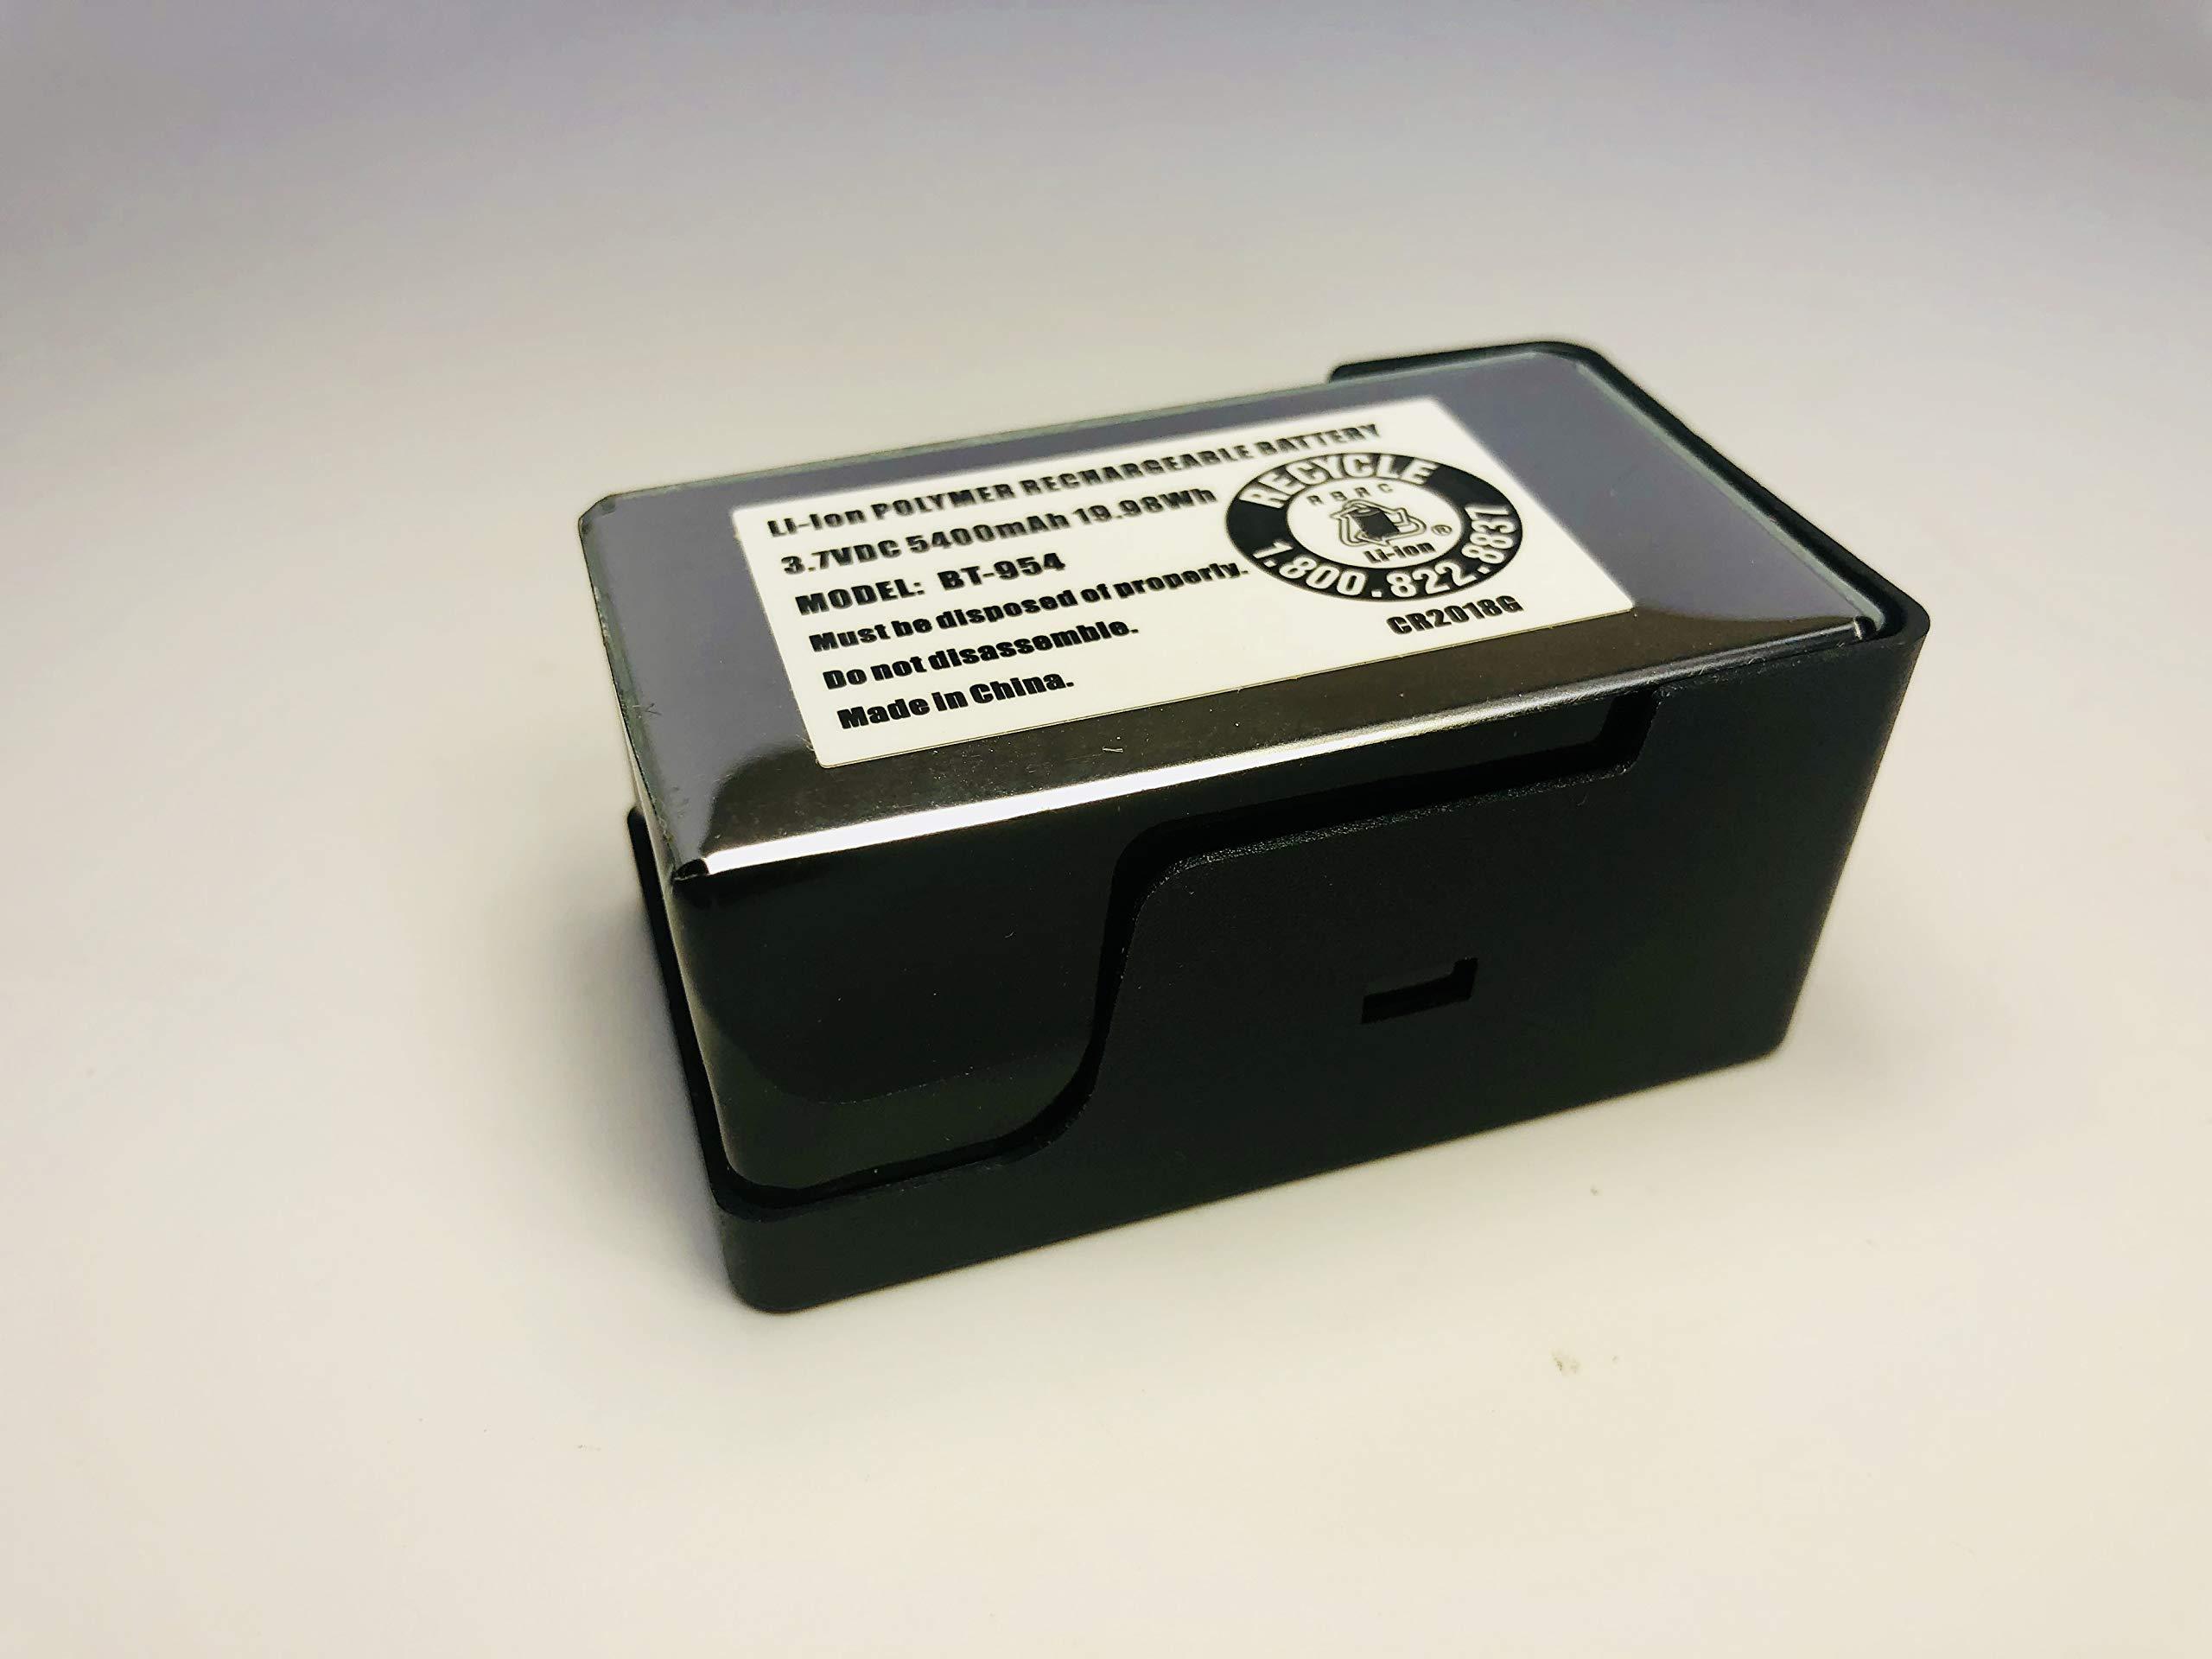 Uniden (EBC100) Accessory External Battery Charger kit for SDS100 Digital Handheld Scanner, Kit Includes one Extended Battery Pack,Black